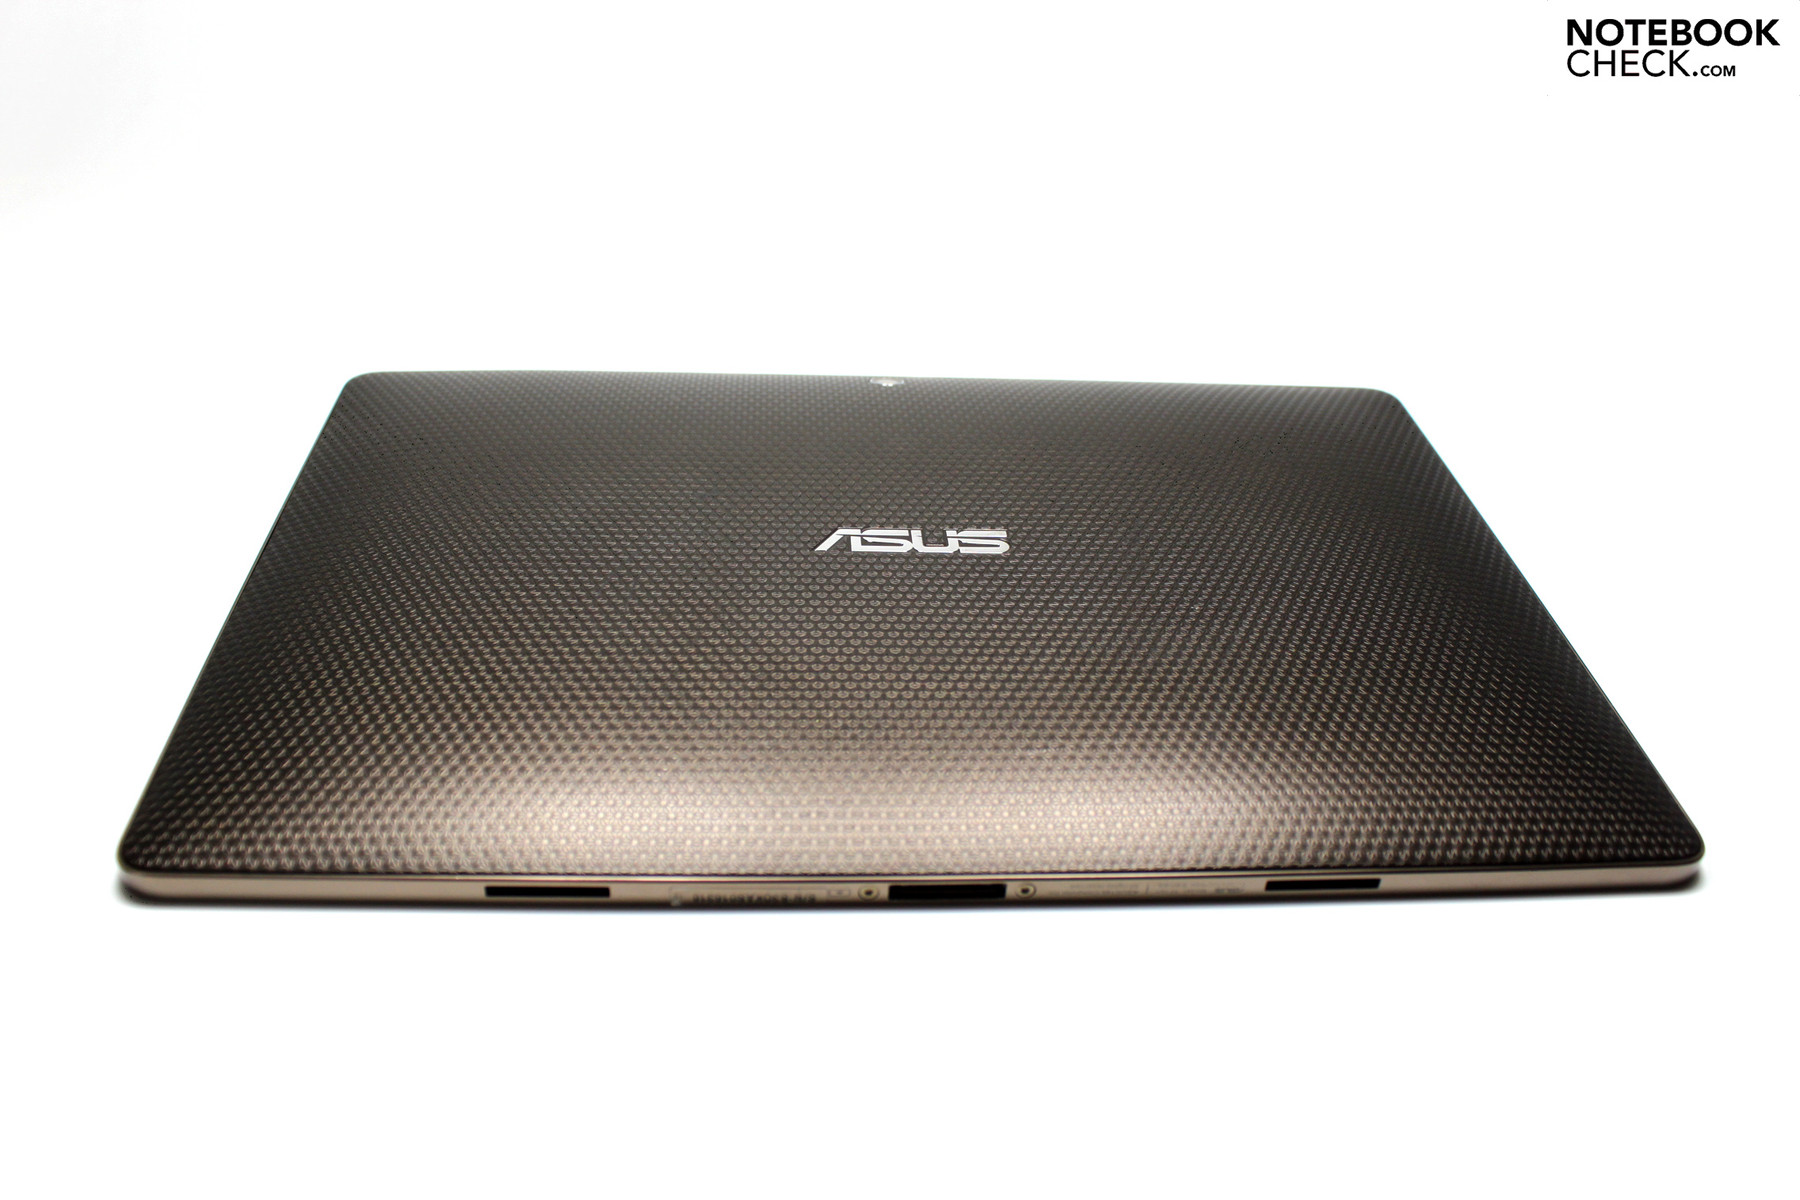 Test Asus Eee Pad Transformer TF101 Tablet/MID ...